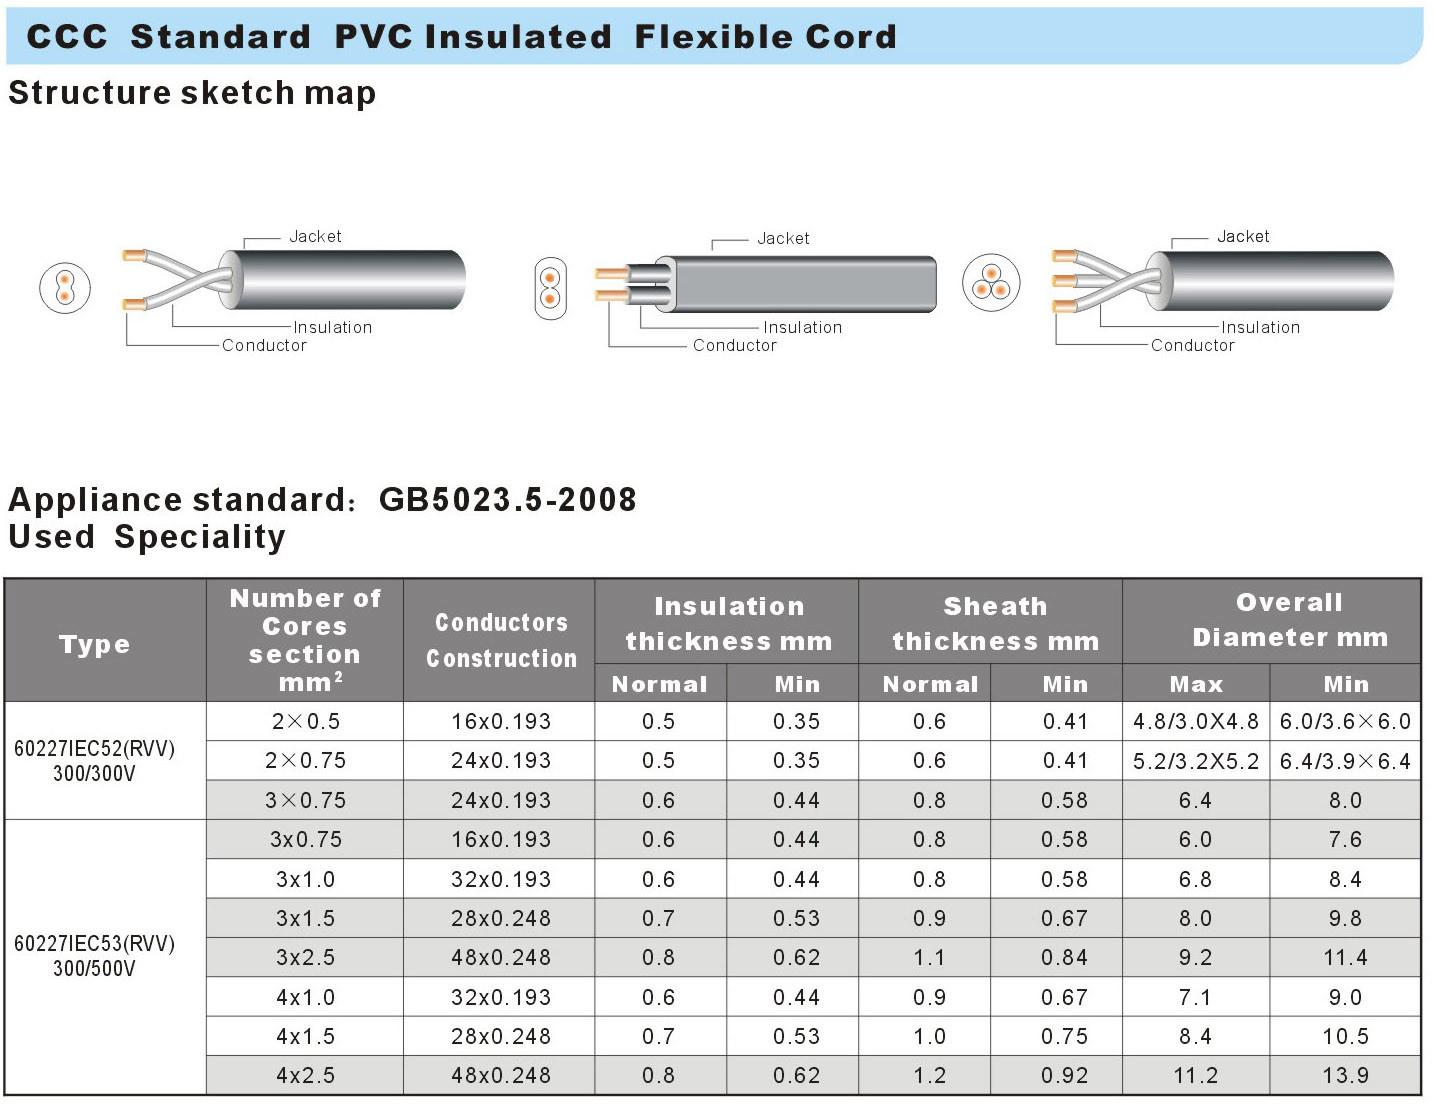 60227 IEC52 (RVV) 60227 IEC53 (RVV) datesheet